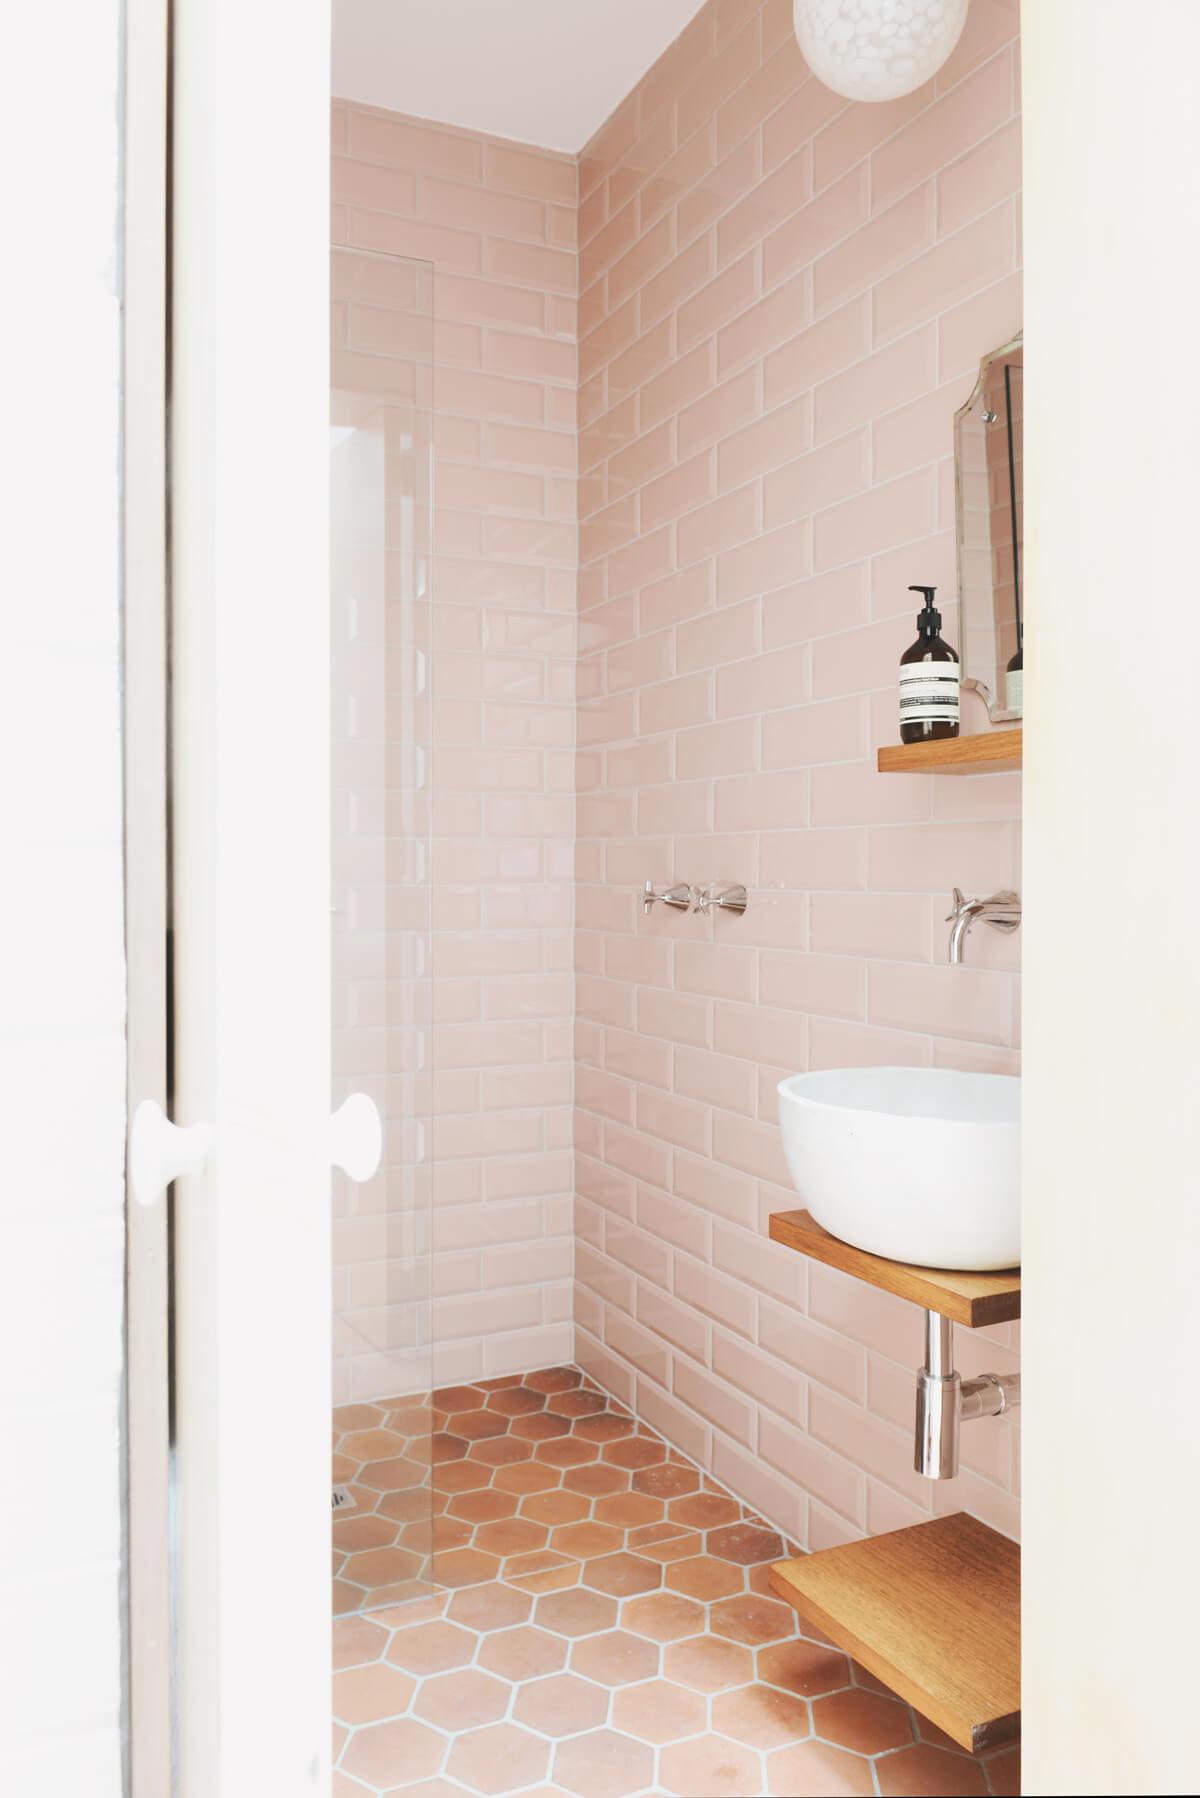 Salle de bain avec carrelage rose clair